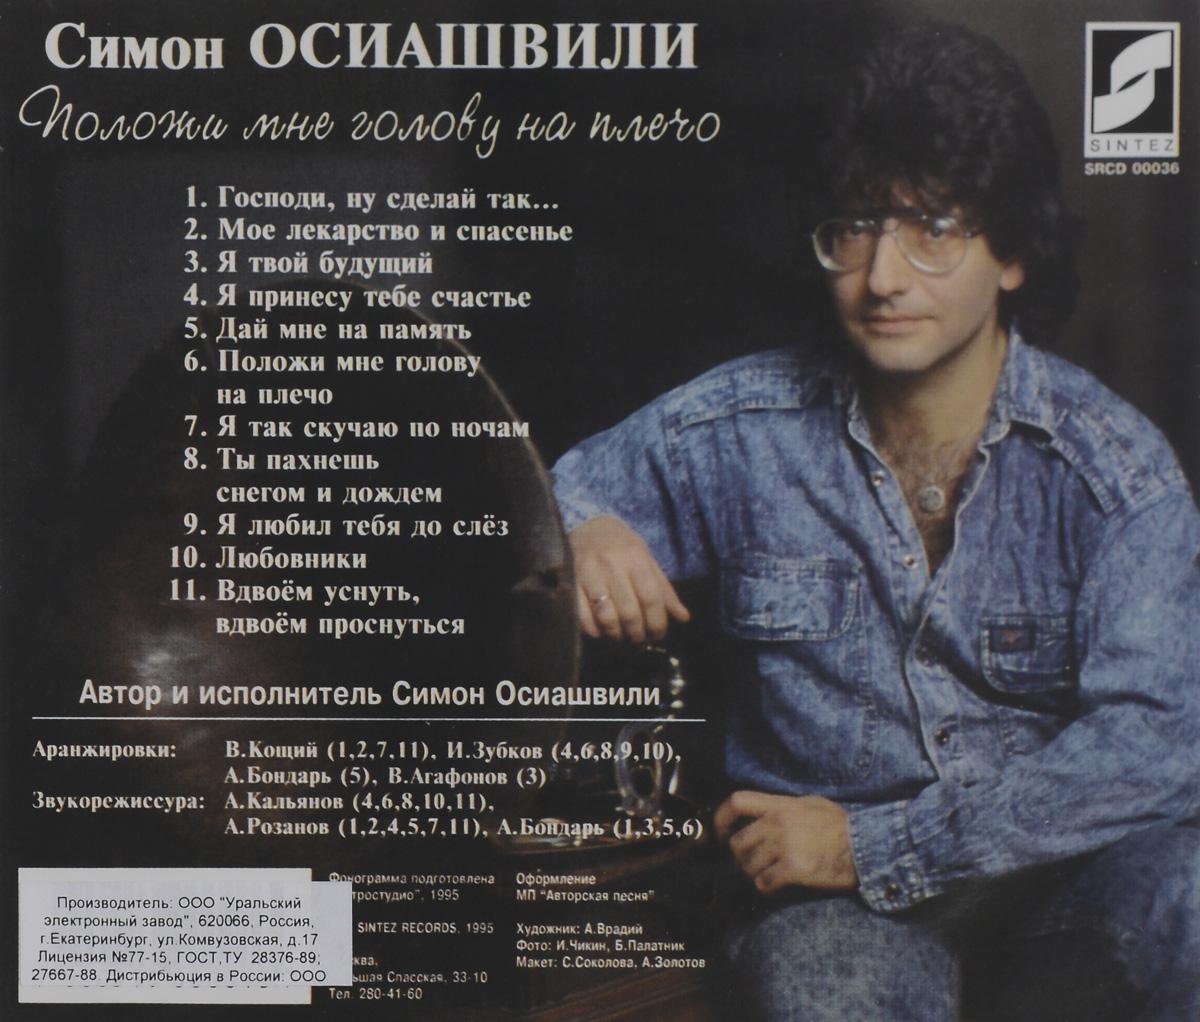 Симон Осиашвили. Положи мне голову на плечо